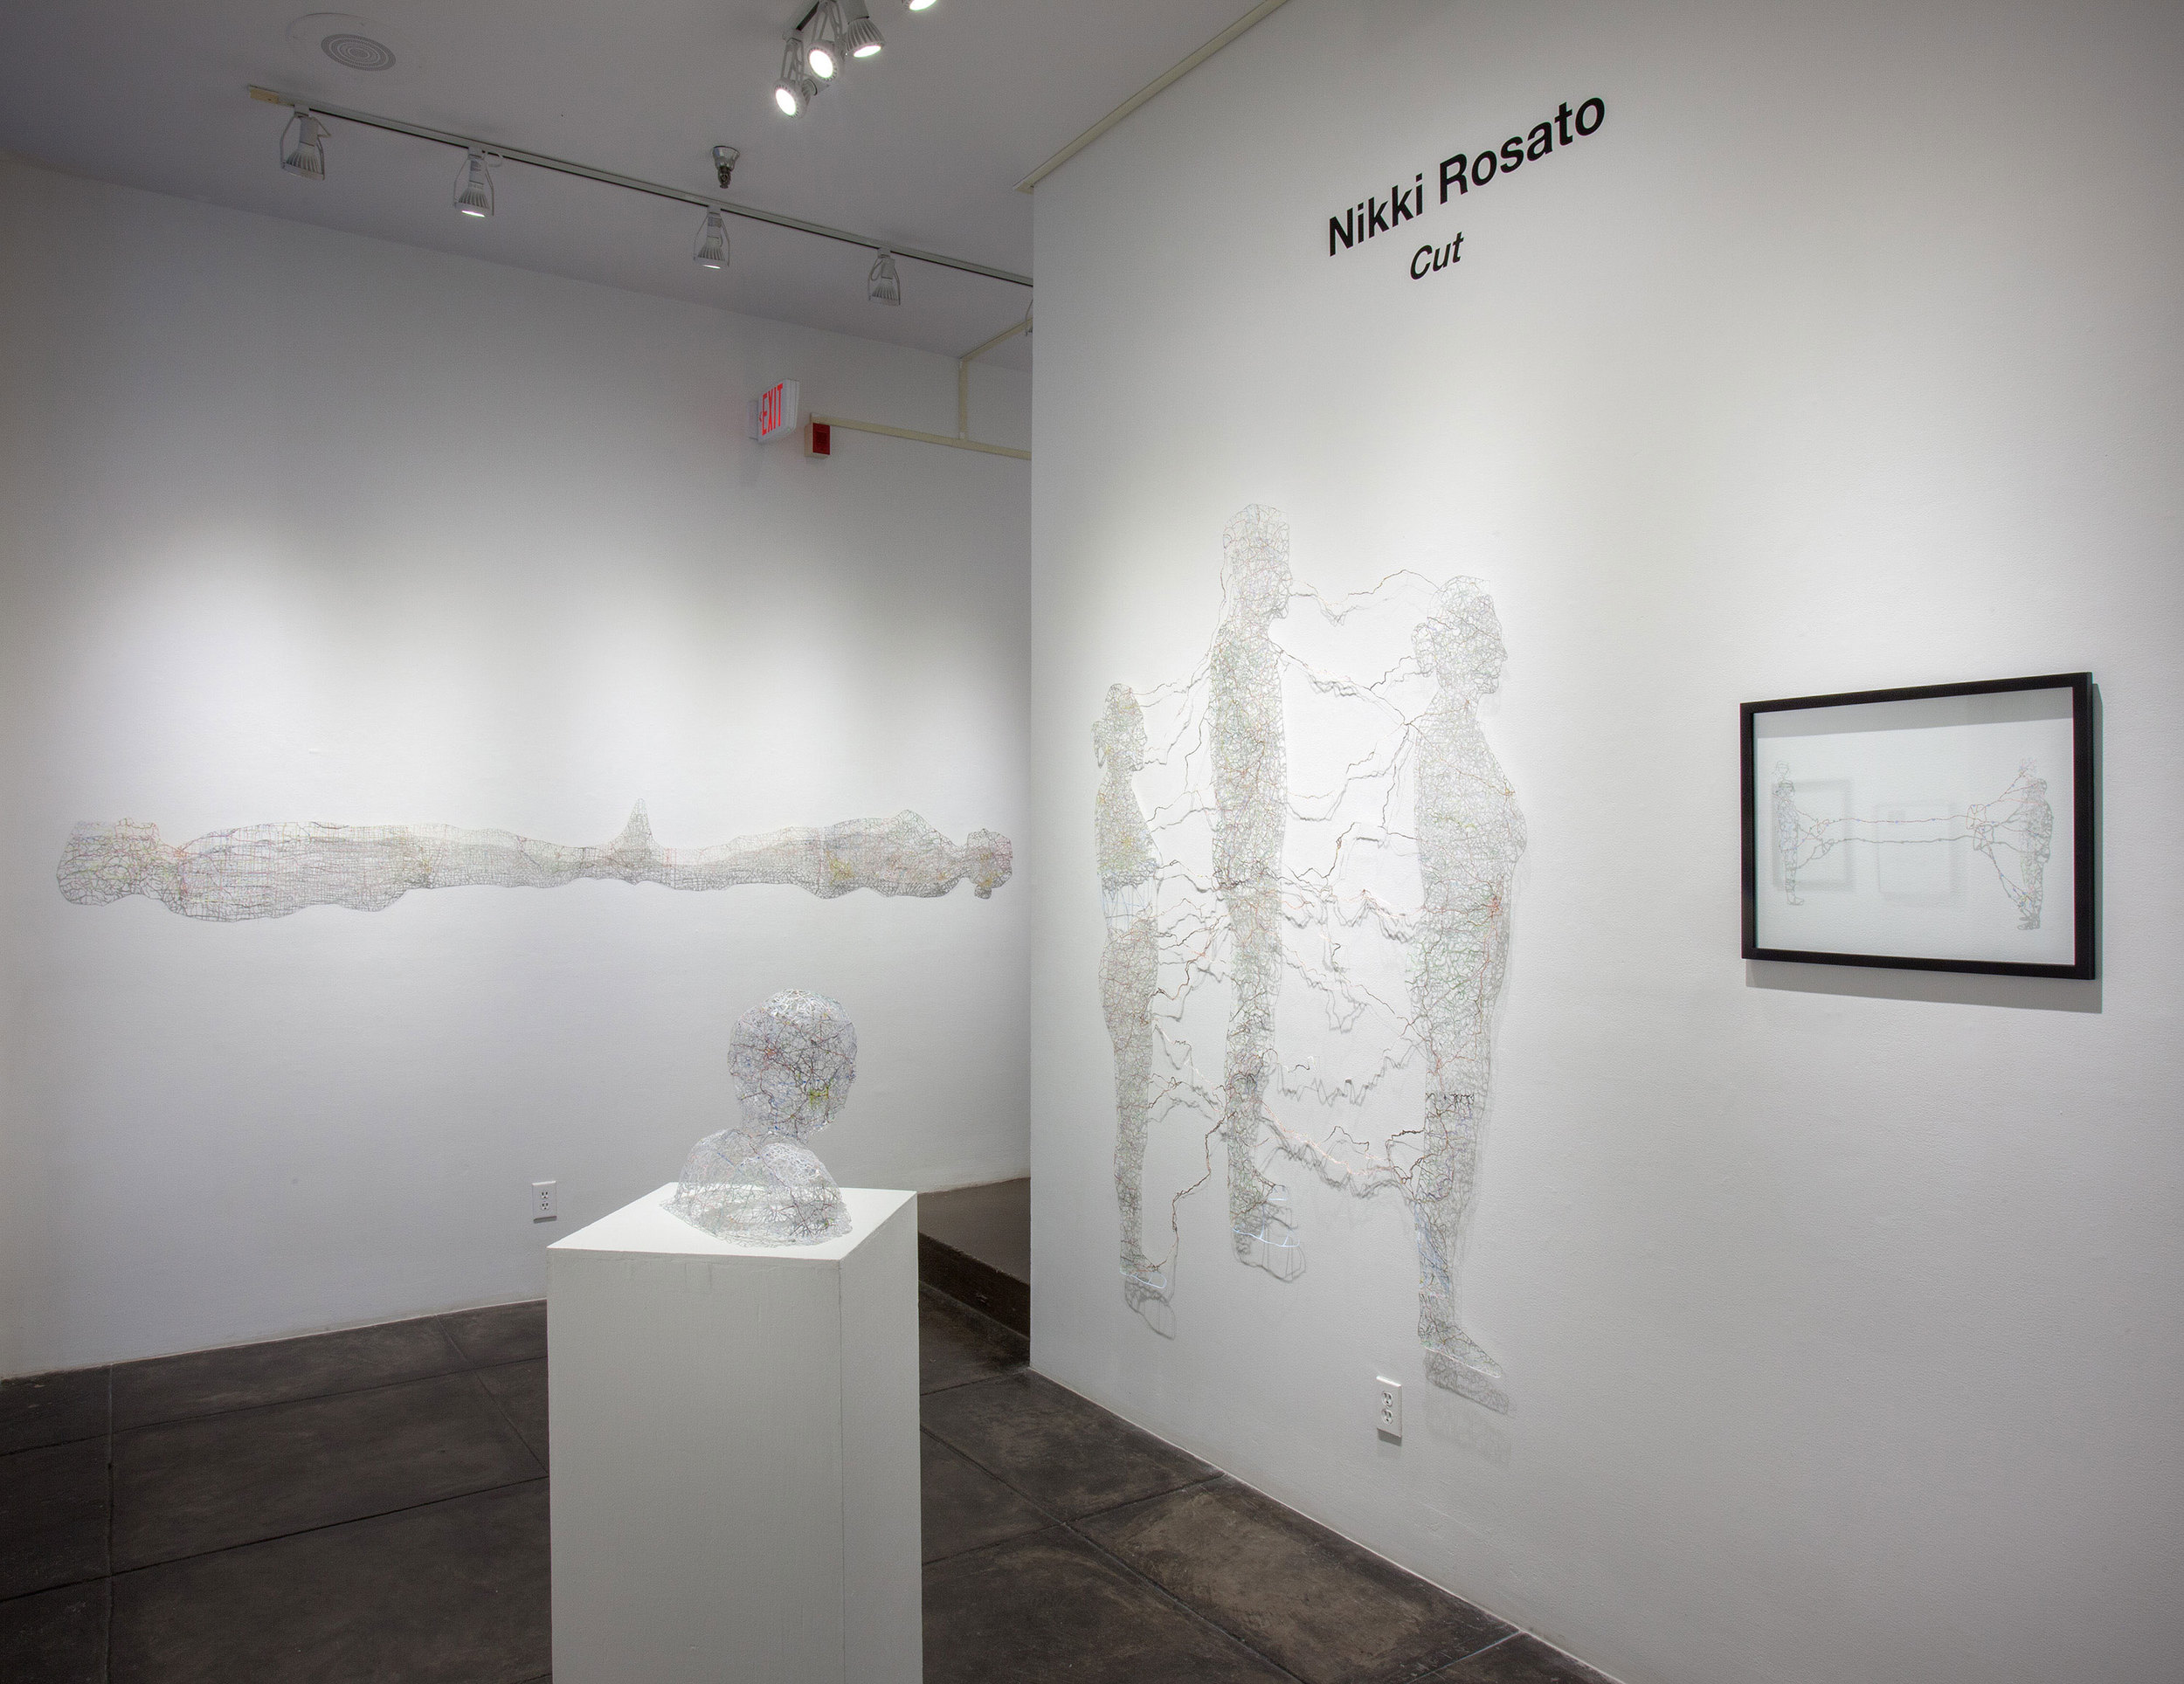 Cut , Solo Exhibition at the Jonathan Ferrara Gallery, 2013